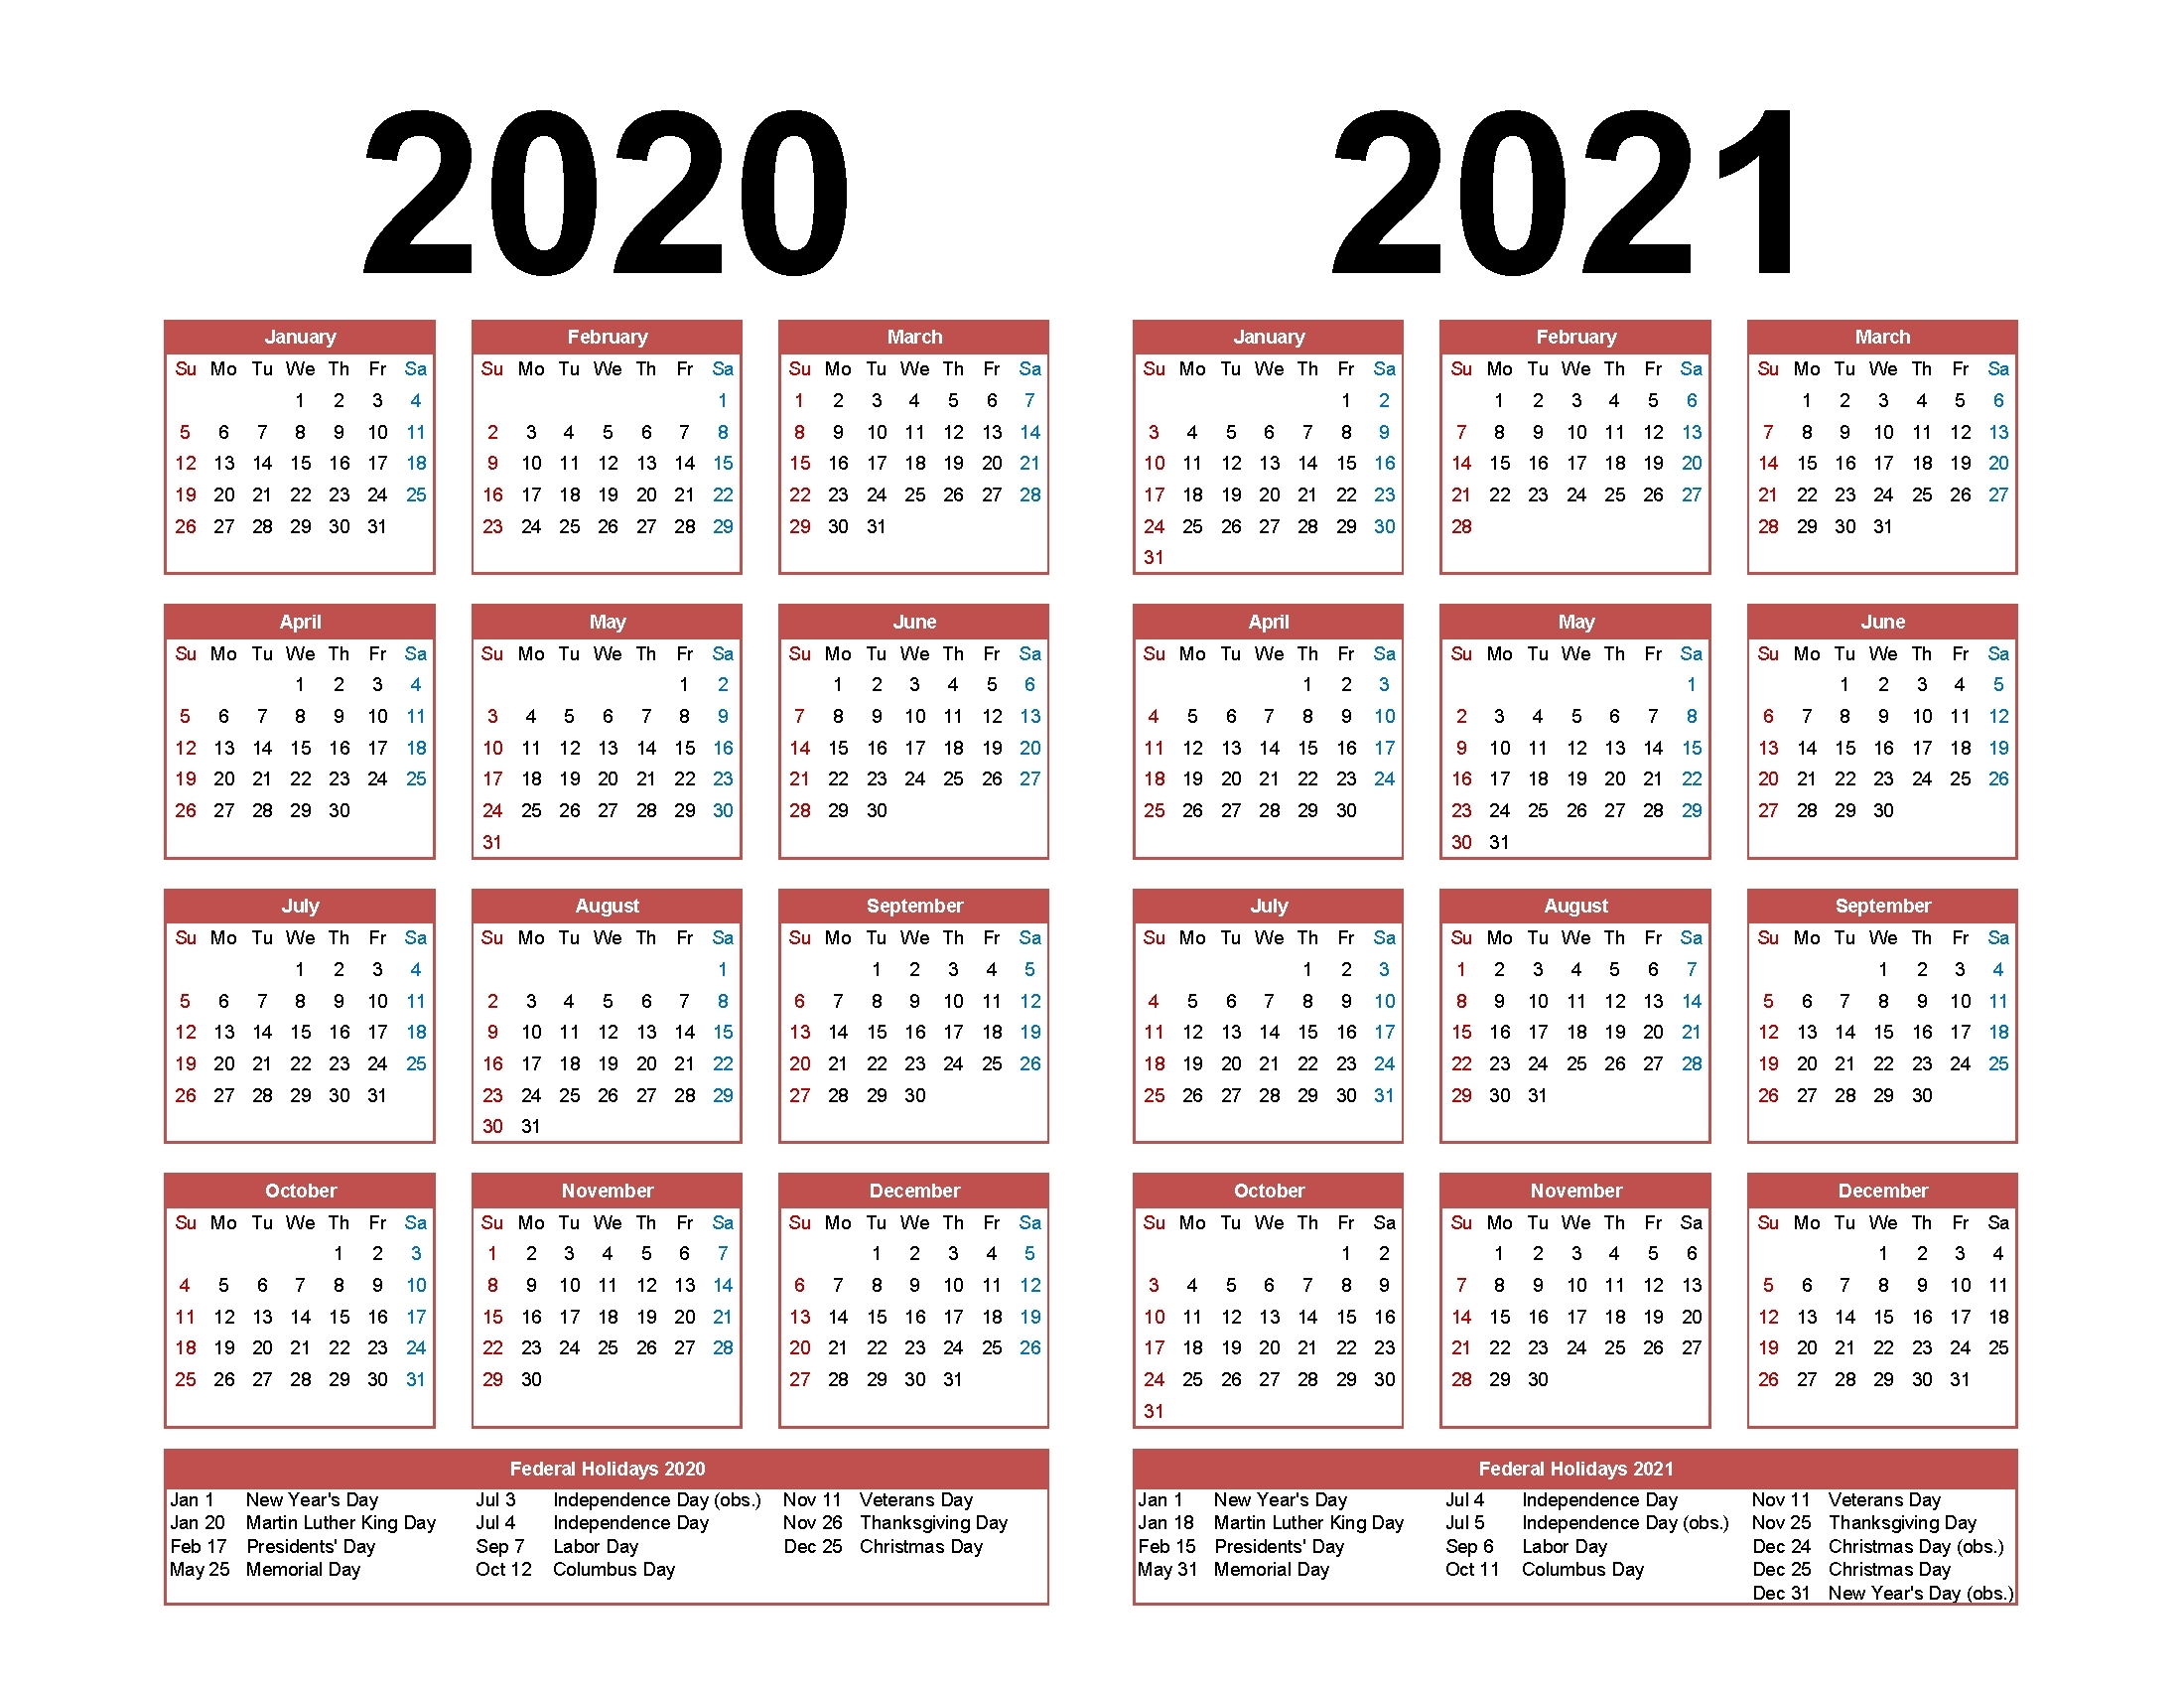 Alvis Romaguera, Author At Calendar Inspiration Design  Depo-Provera 2021 Calendar Printable Pdf